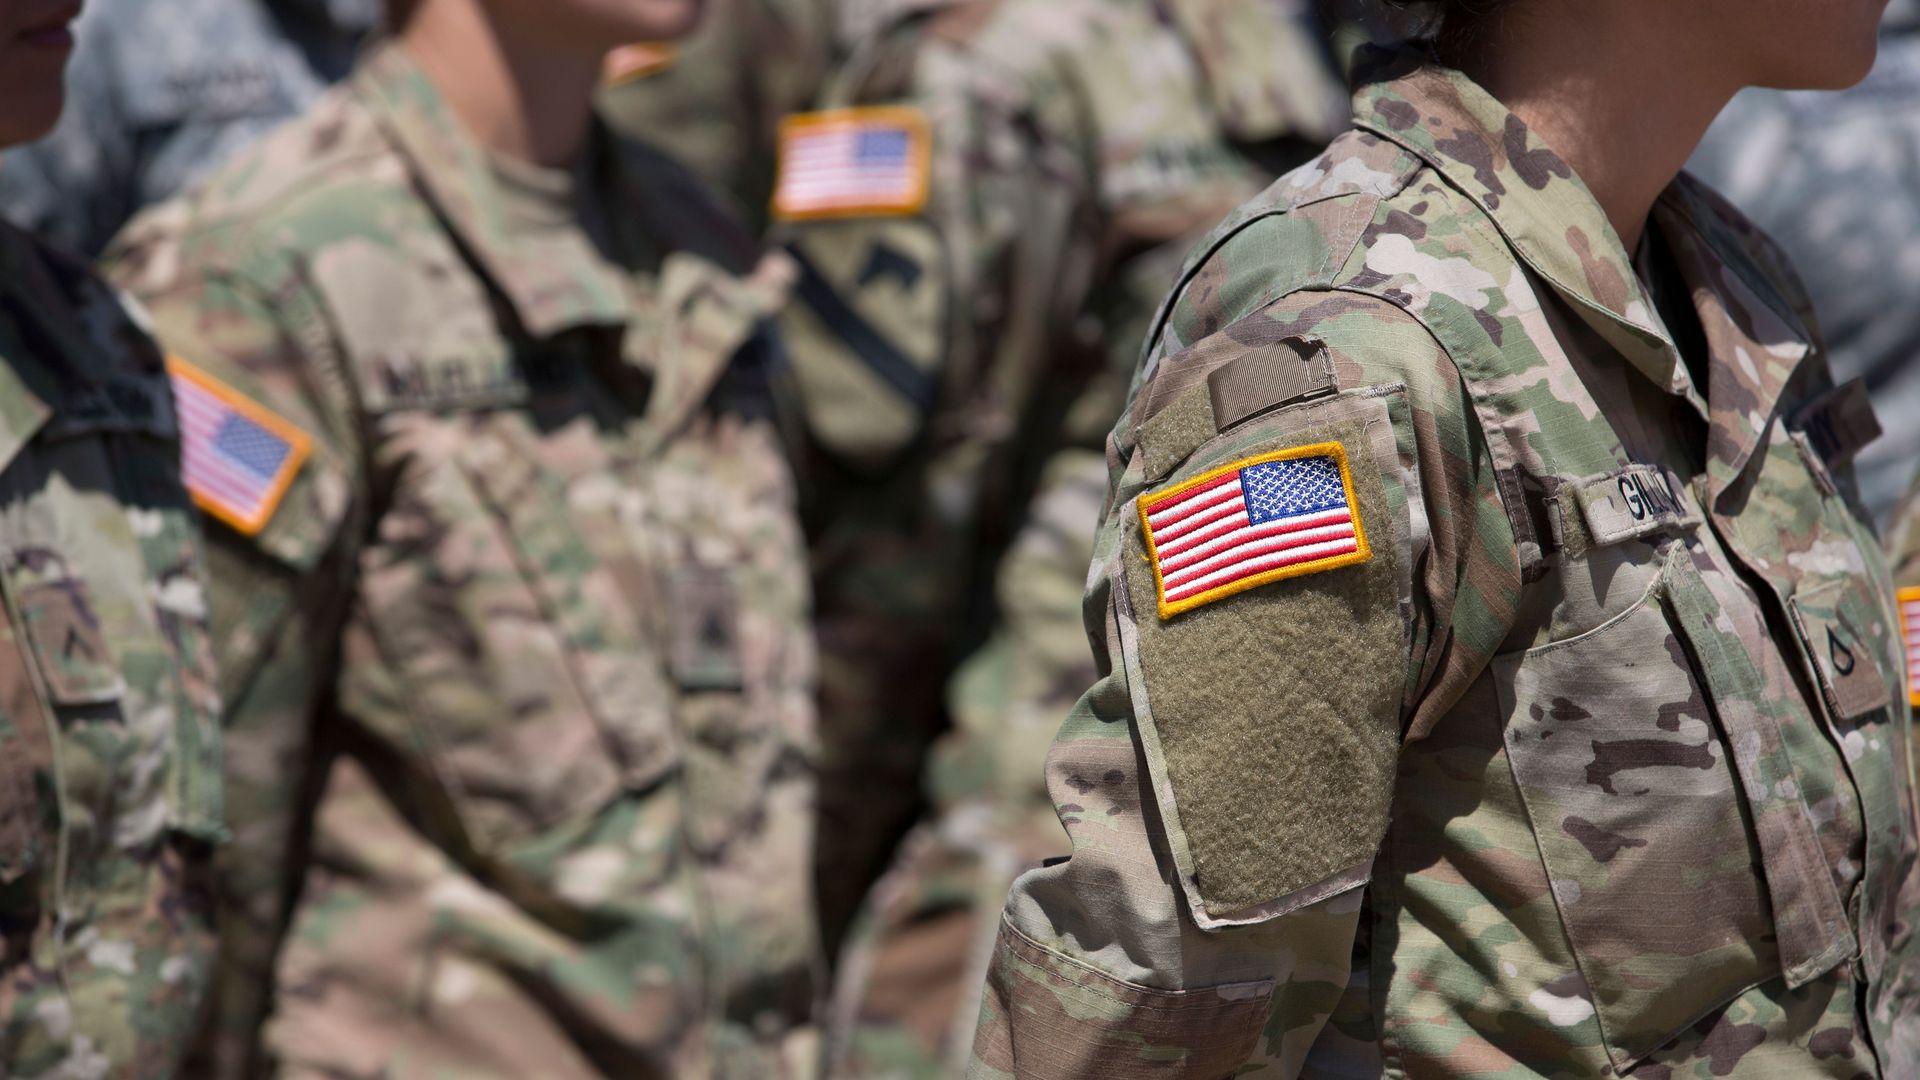 5 state National Guards defy Trump's transgender military ban